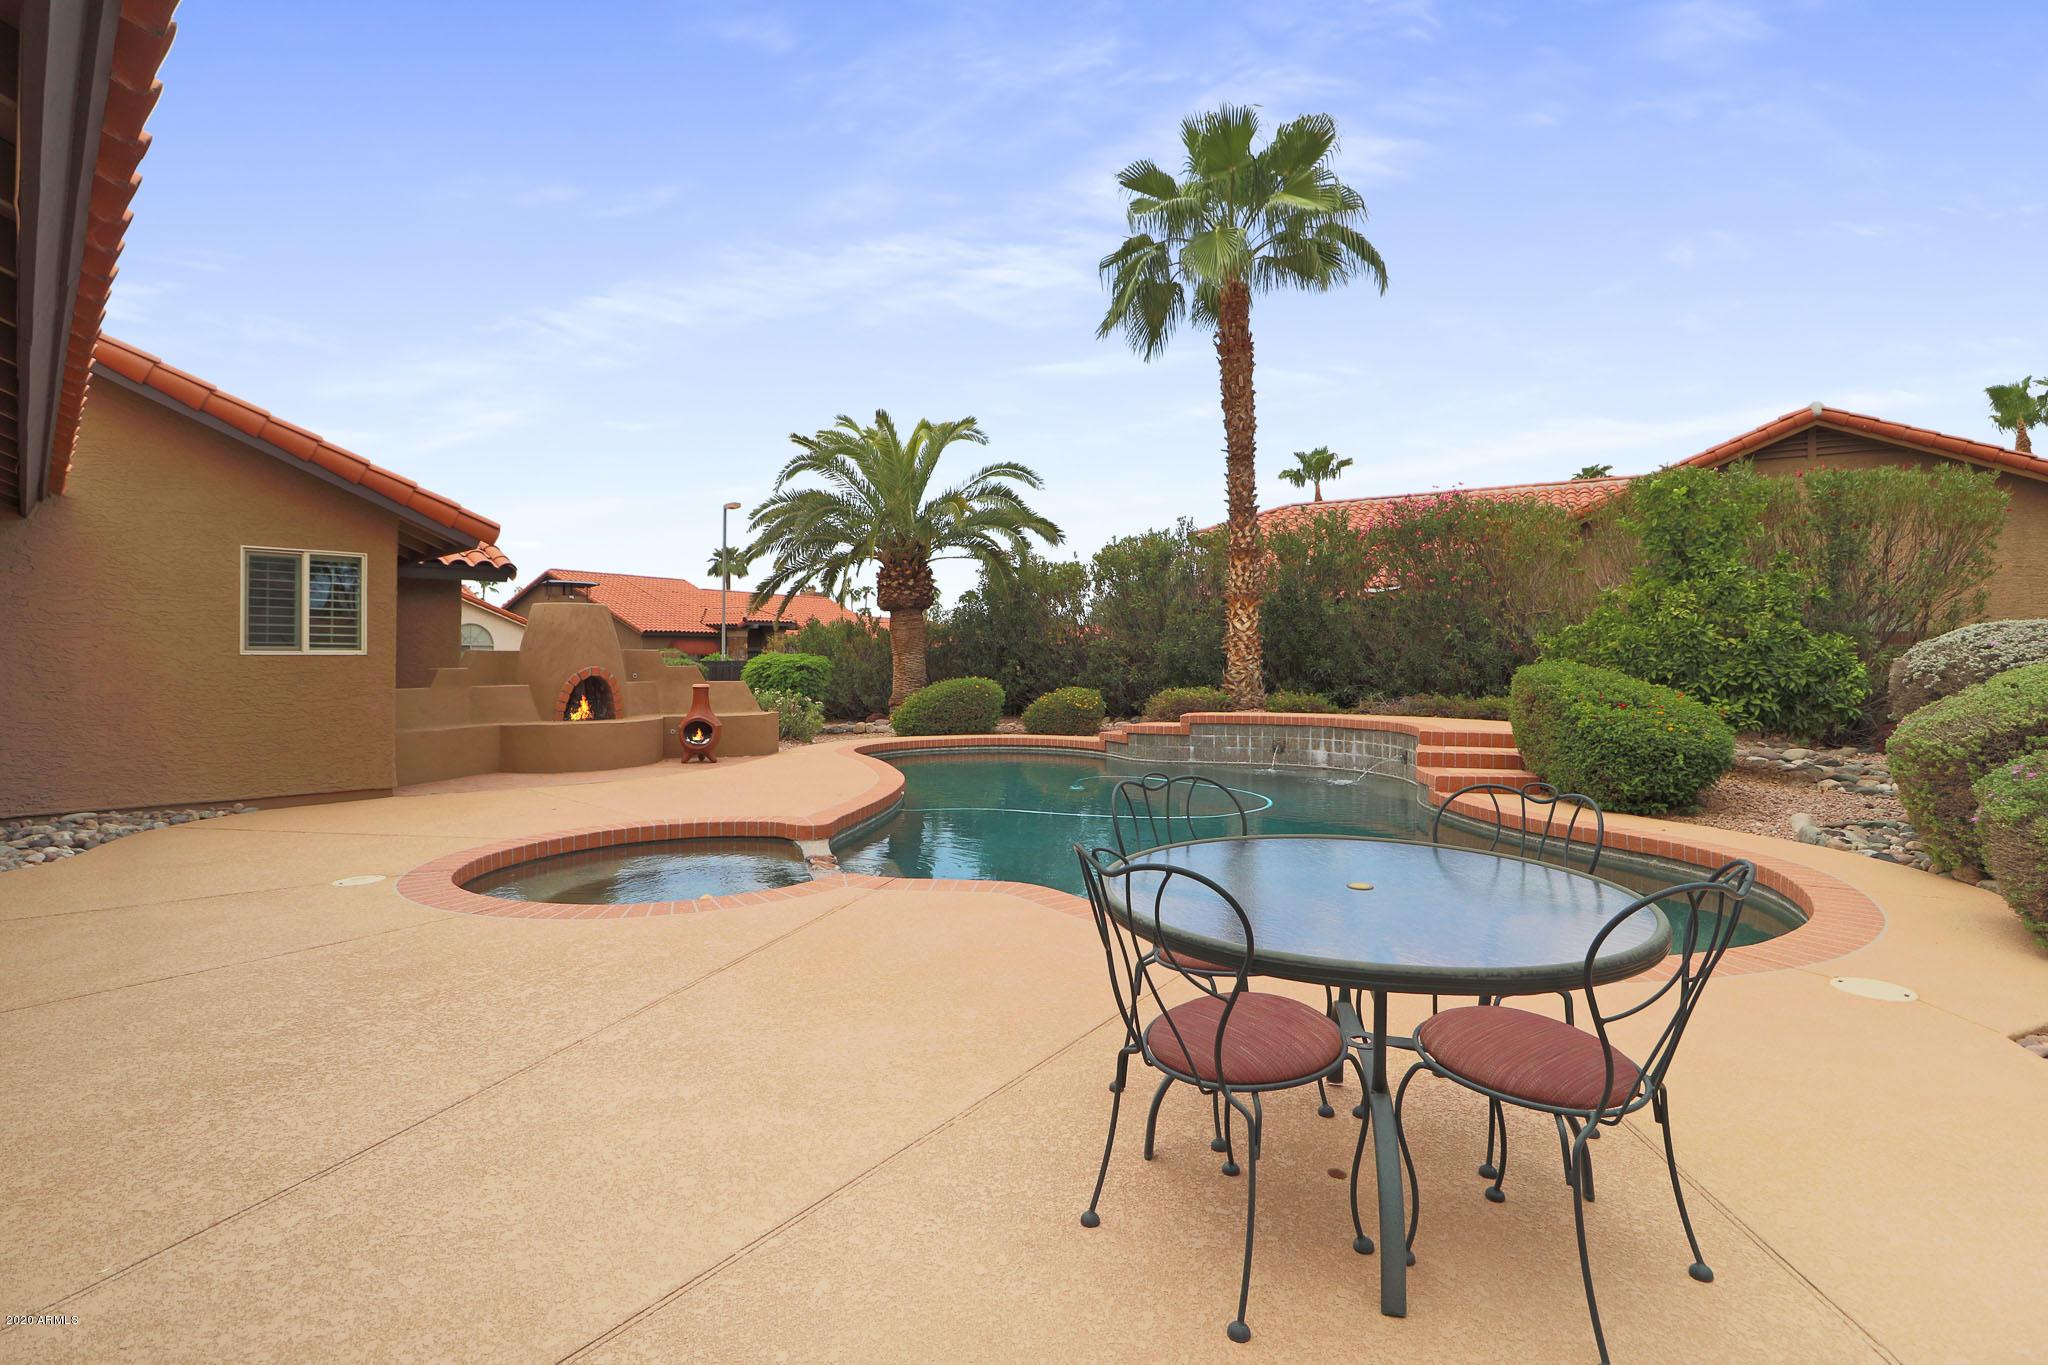 MLS 6136611 10484 E MISSION Lane, Scottsdale, AZ 85258 Scottsdale AZ Private Pool